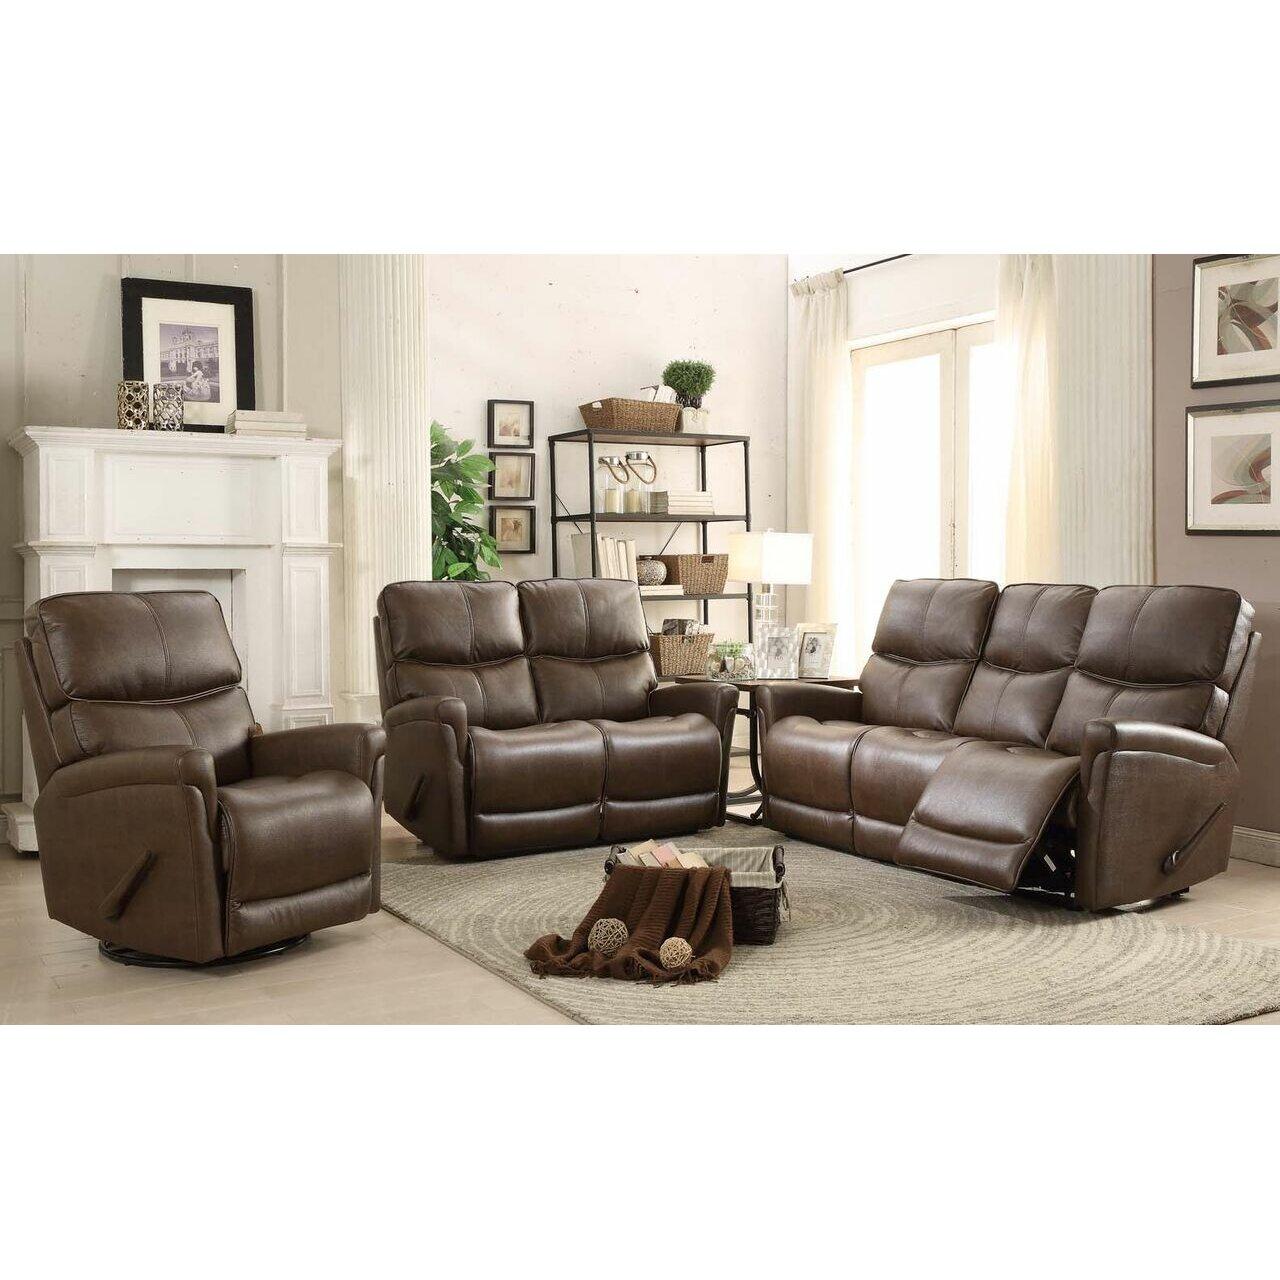 Easy living cologne 3 piece reclining living room set for 3 piece living room set